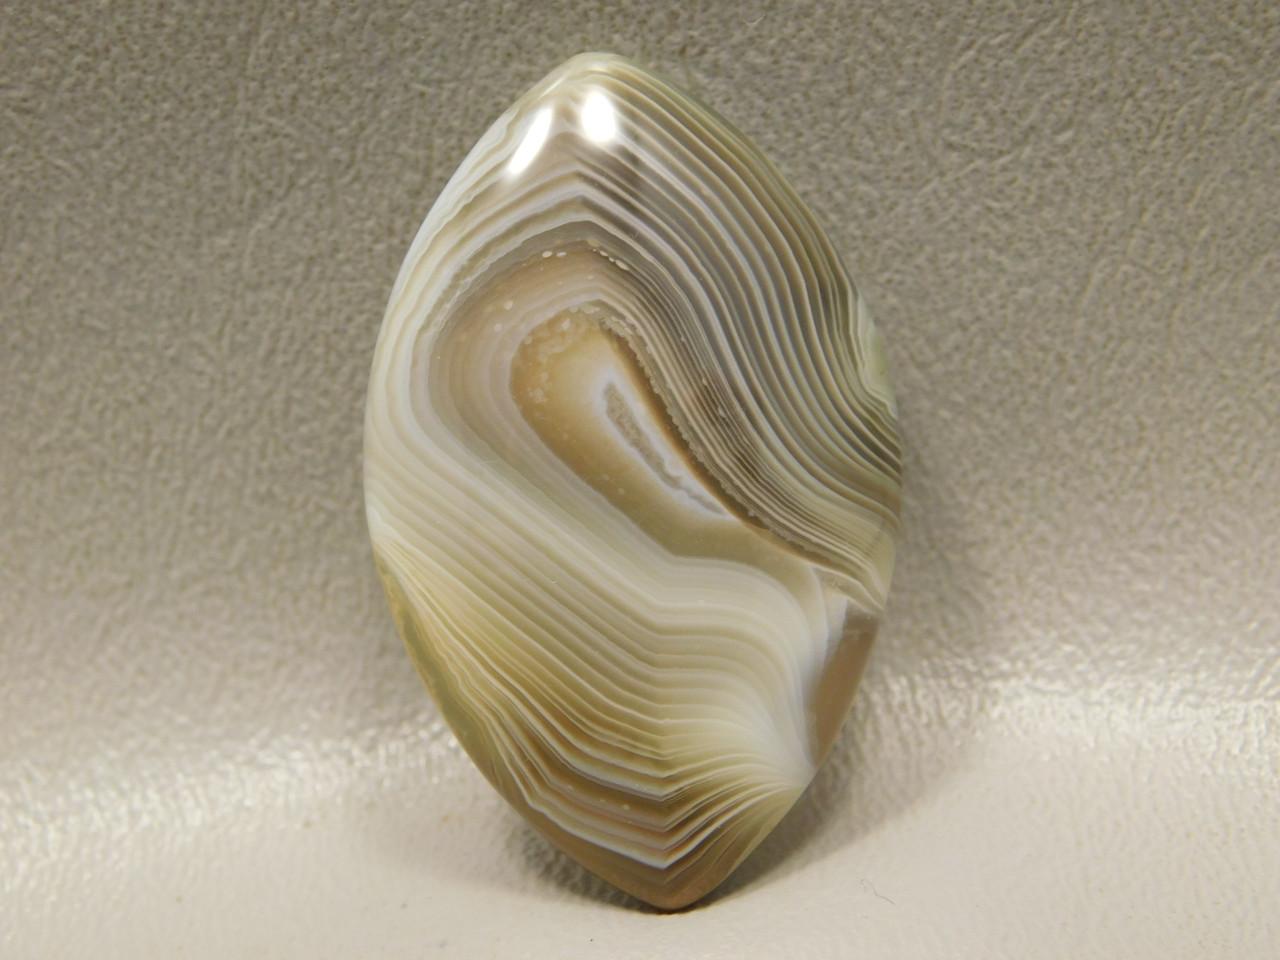 Botswana Agate Marquis Shaped Cabochon Stone #16